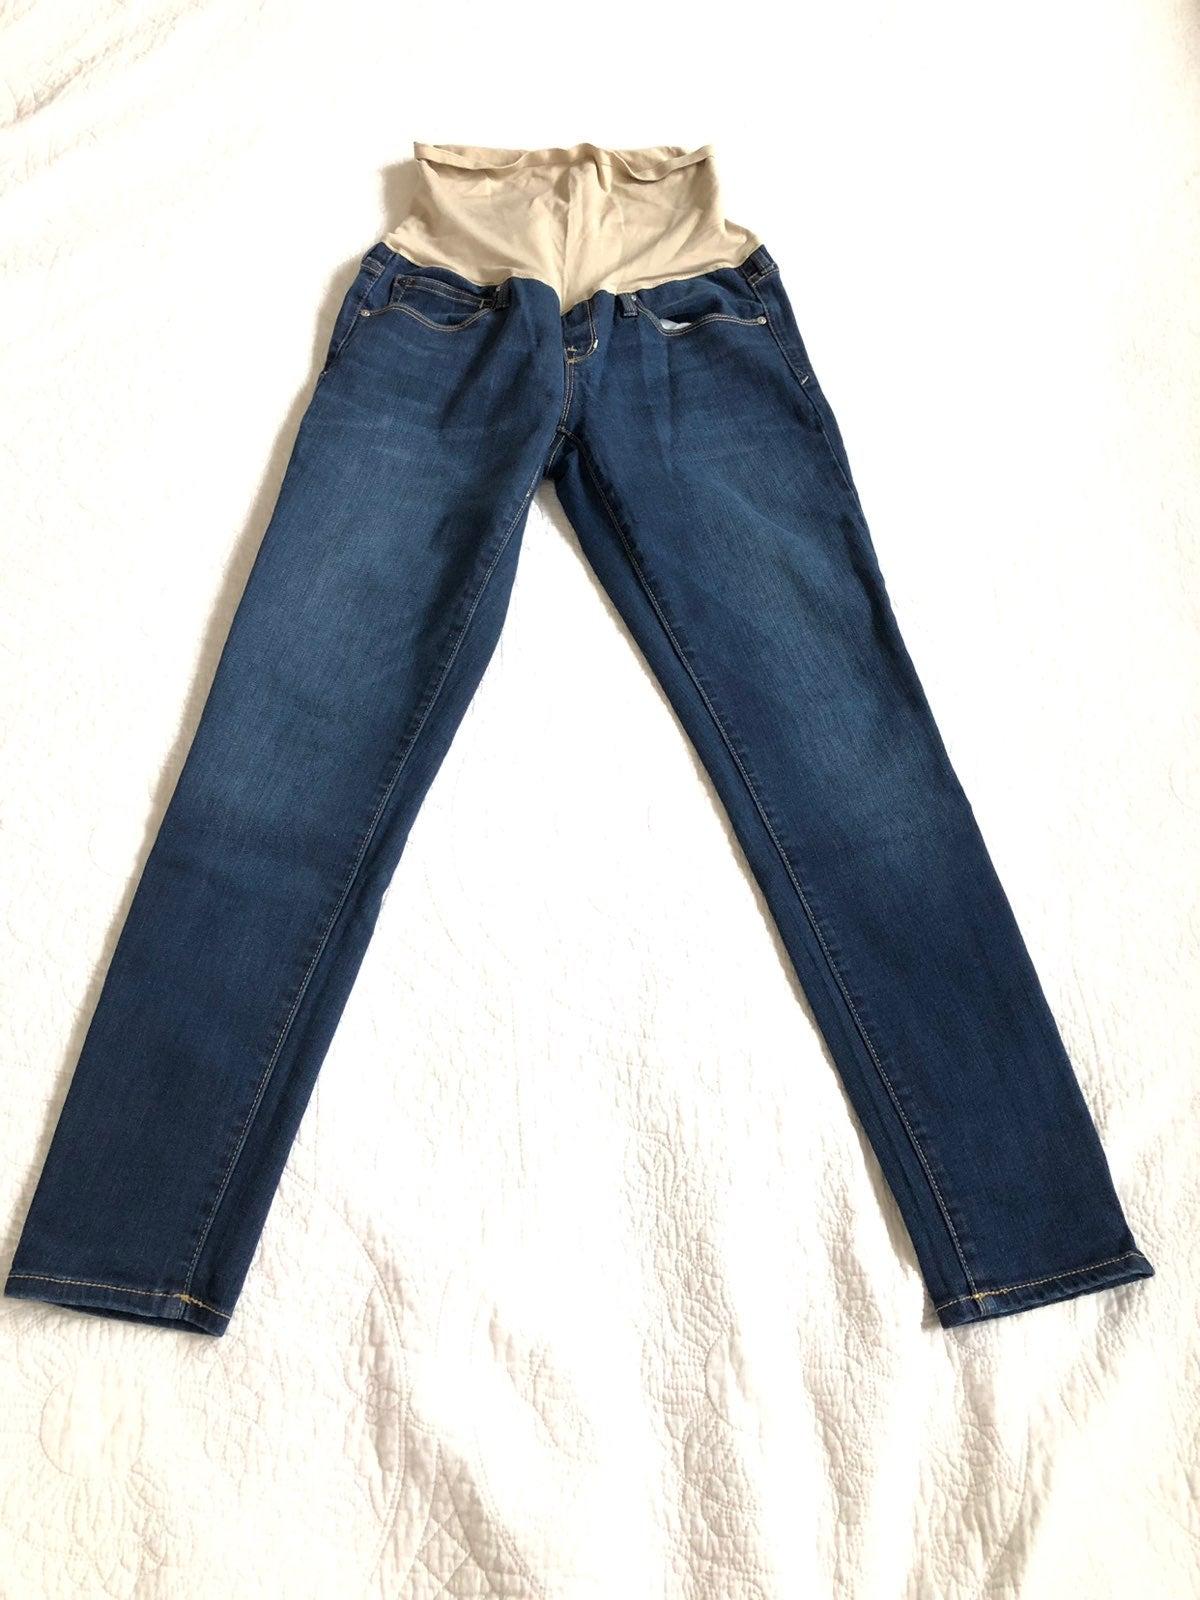 Maternity Denim Pants By Gap Size 26/2s